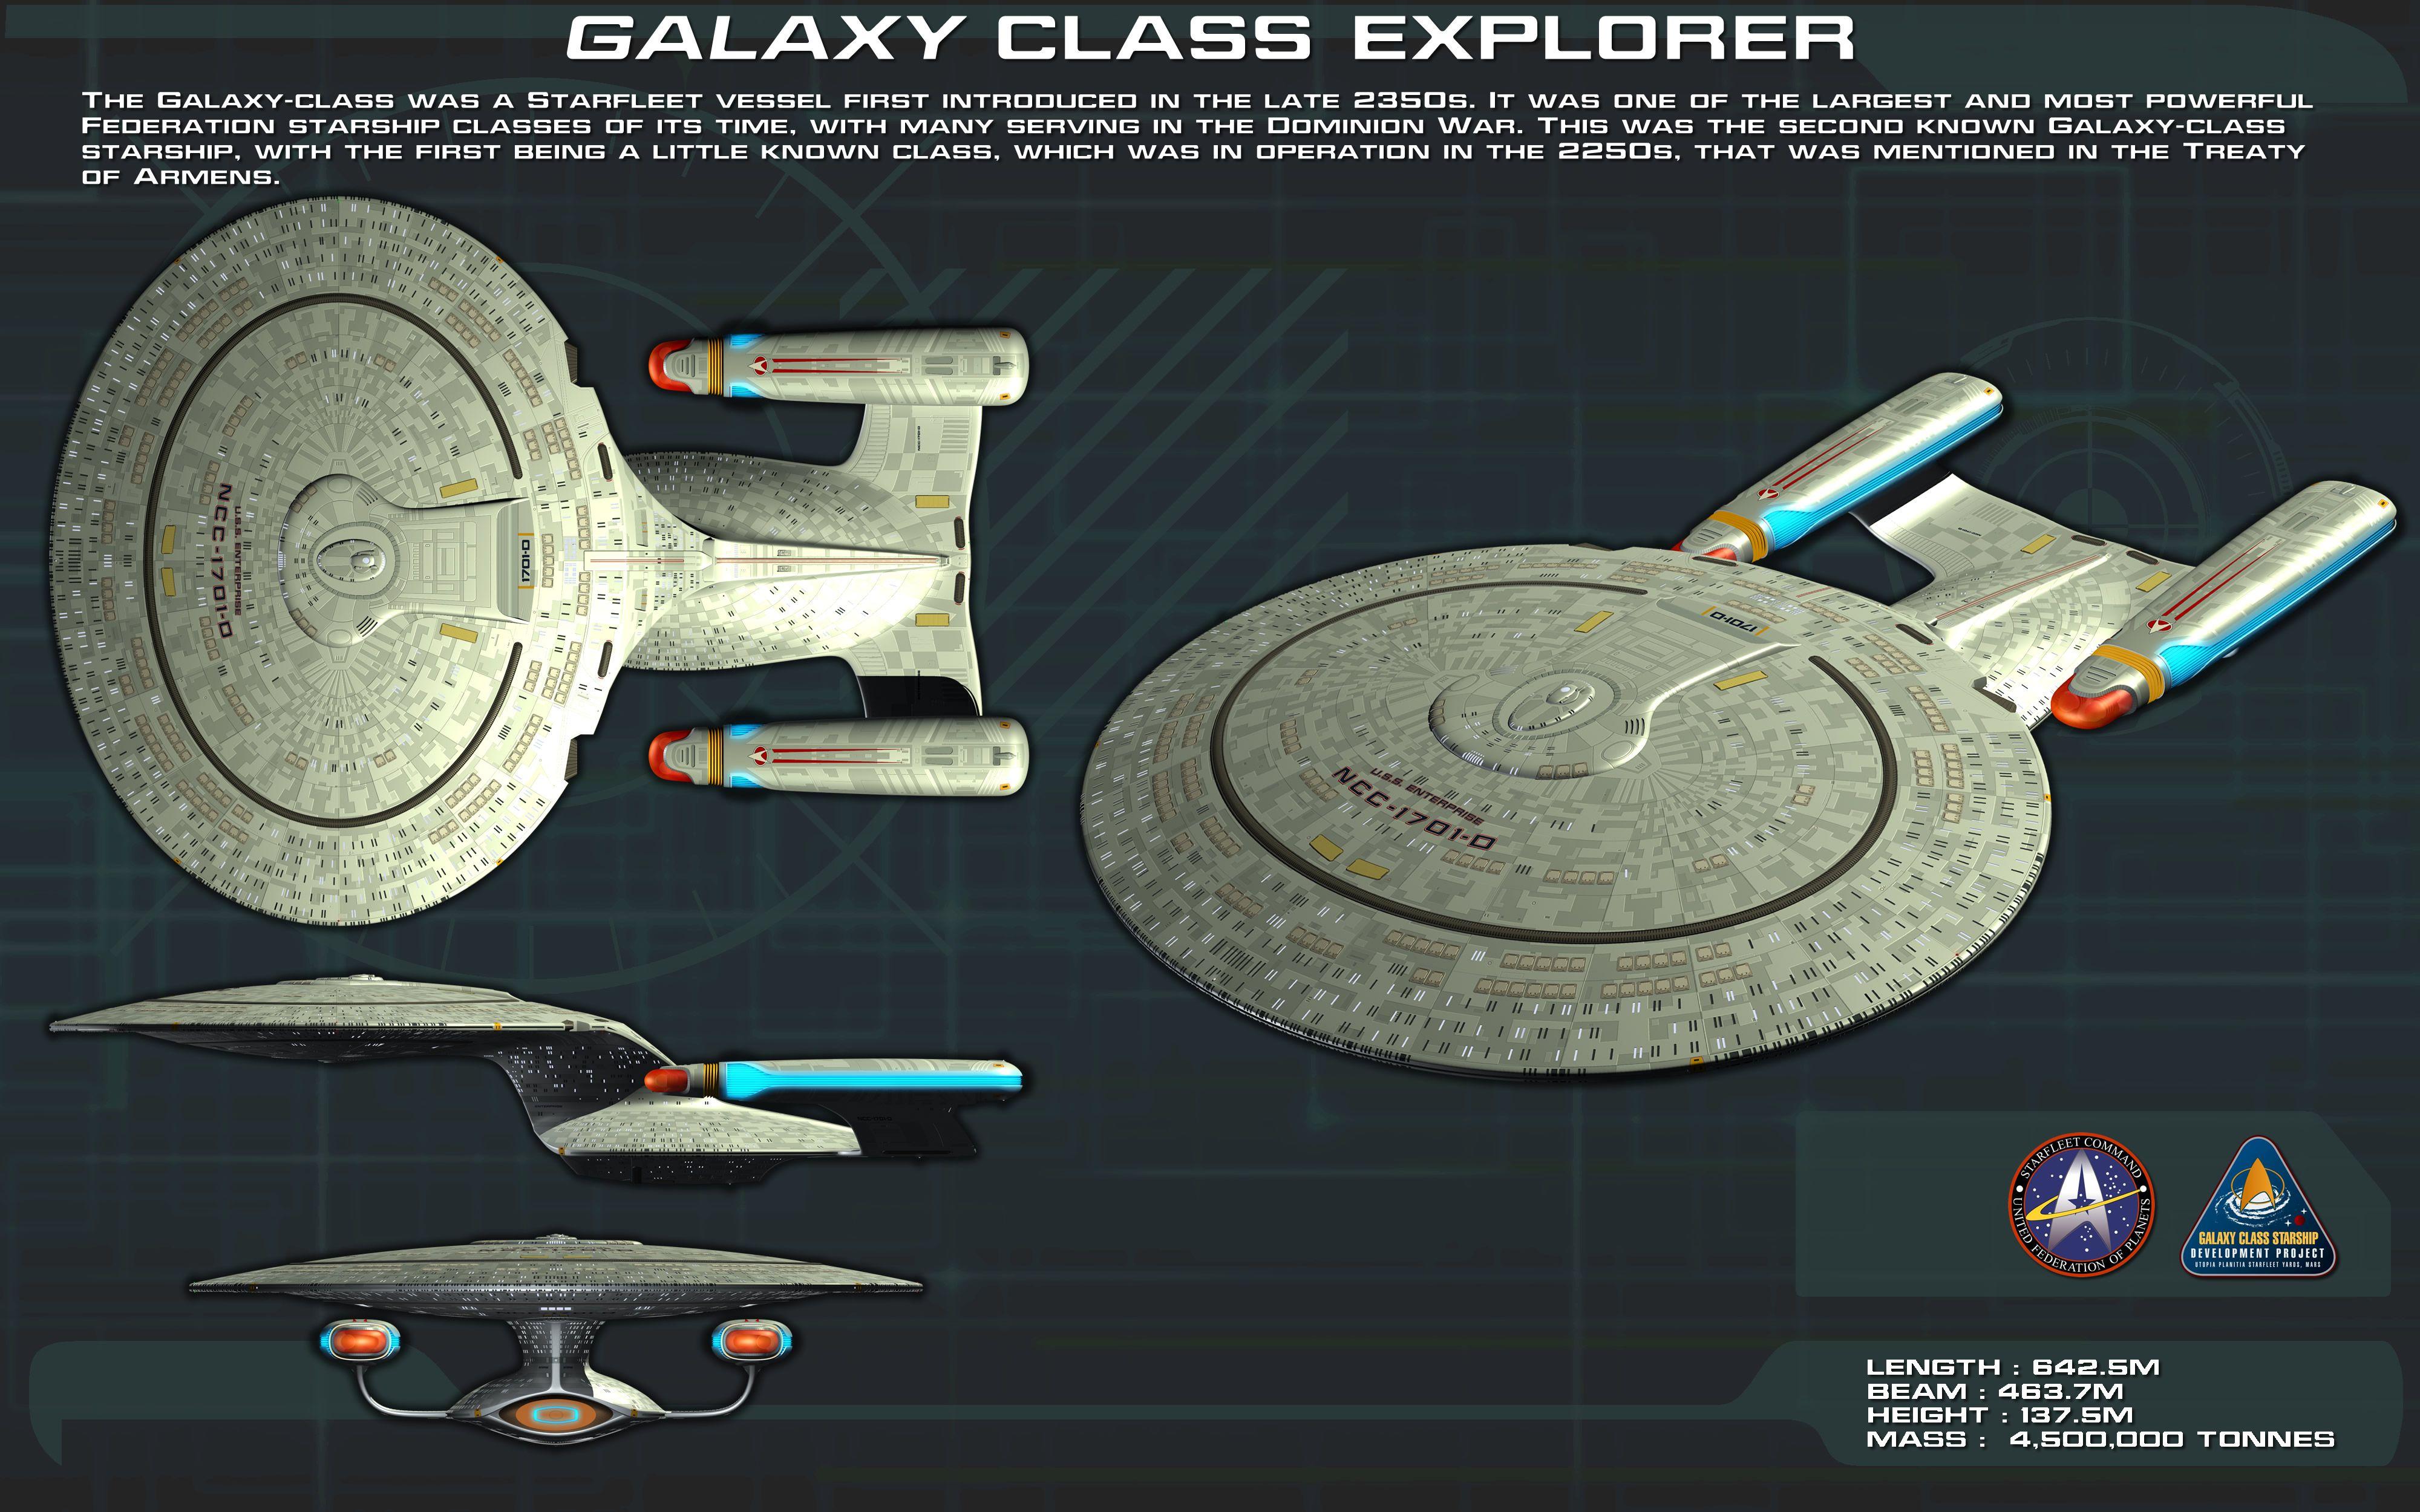 Galaxy Class ortho [new] by unusualsuspex.deviantart.com on @deviantART